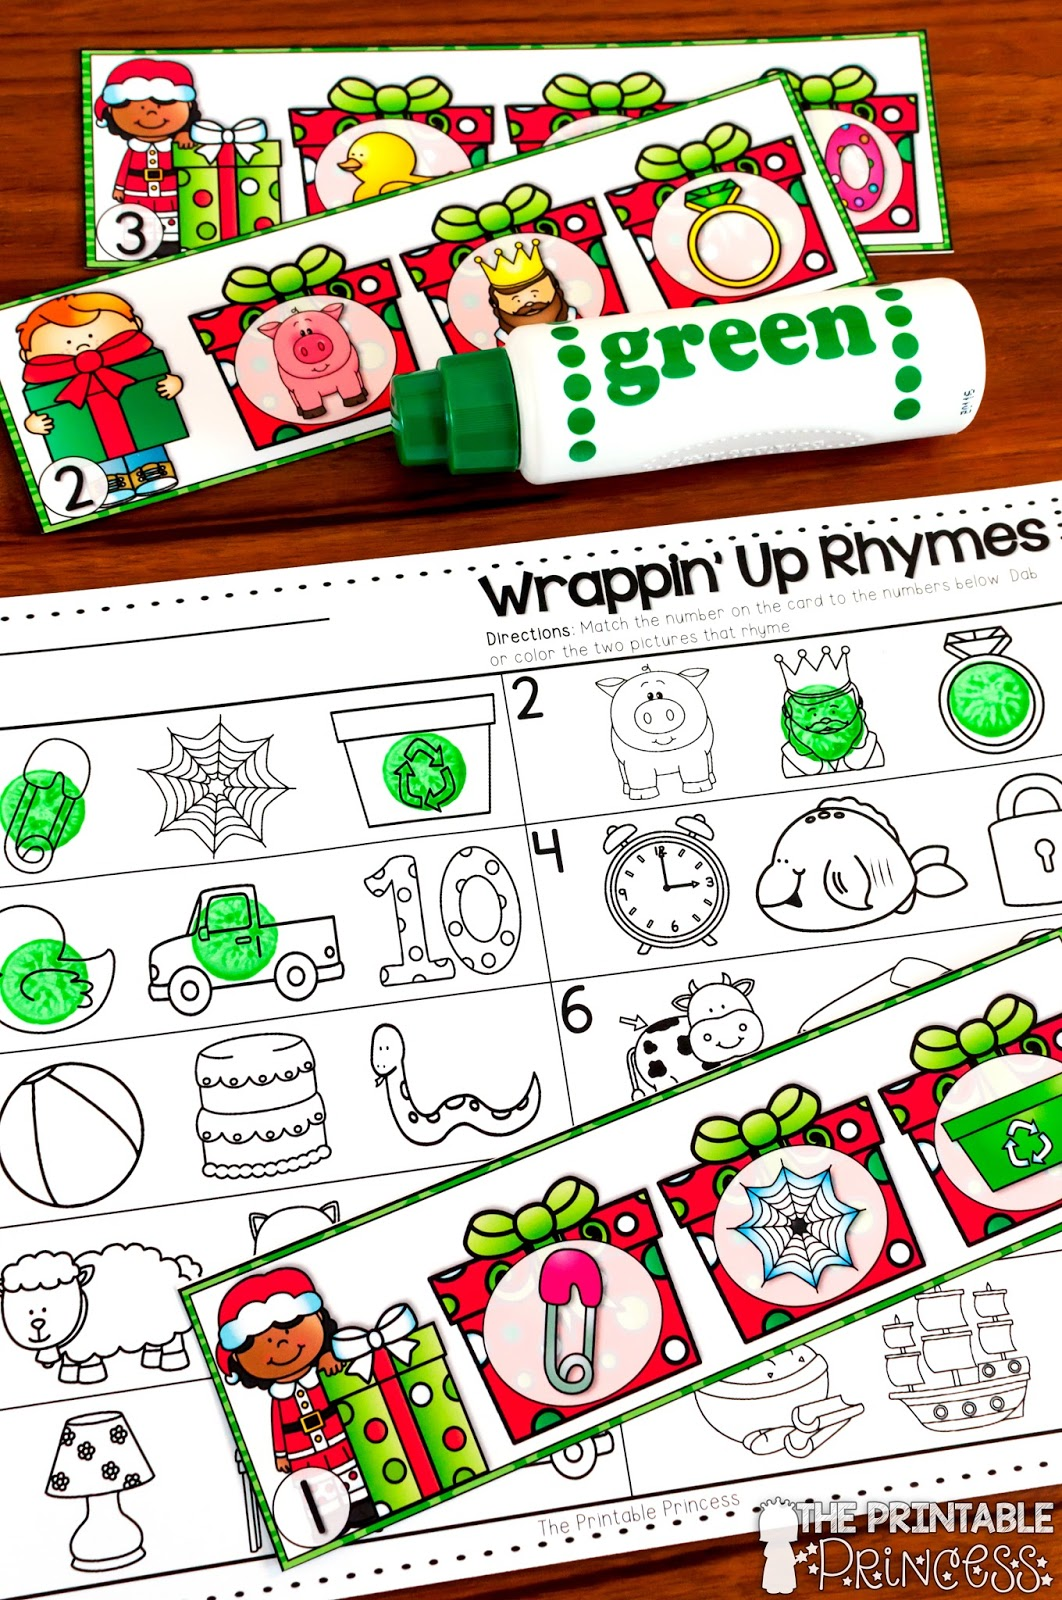 The Printable Princess Christmas Literacy And Math Activities For Kindergarten